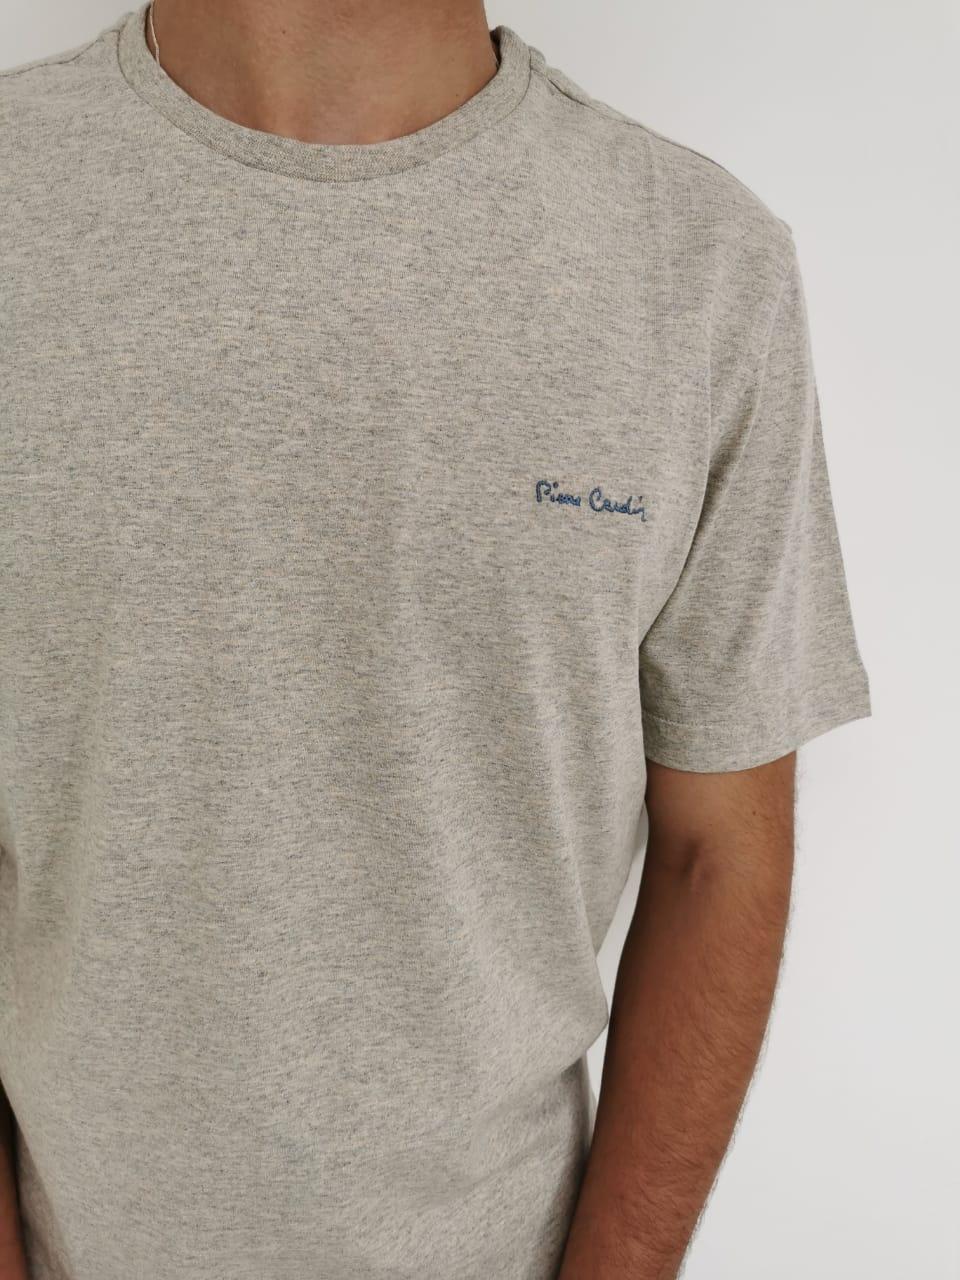 Camiseta Pierre Cardin Bege